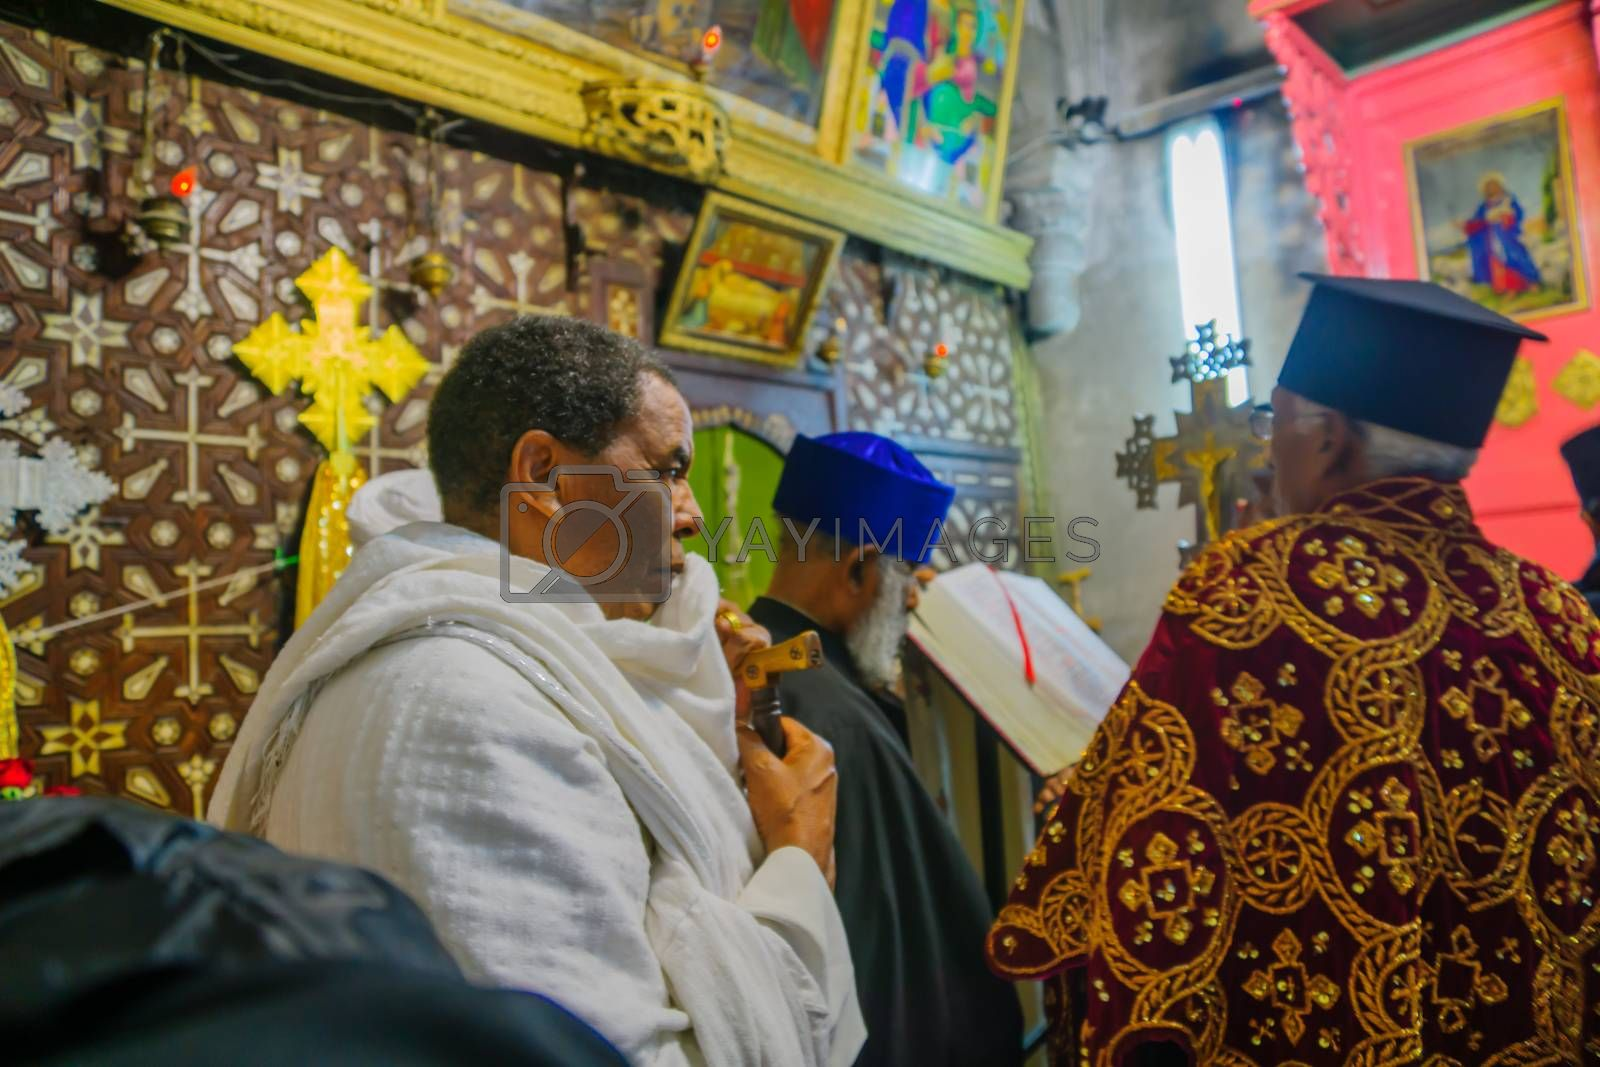 JERUSALEM, ISRAEL - APRIL 29, 2016: An Orthodox Good Friday pray of the Ethiopian community. The church of the Holy Sepulcher, the old city of Jerusalem, Israel